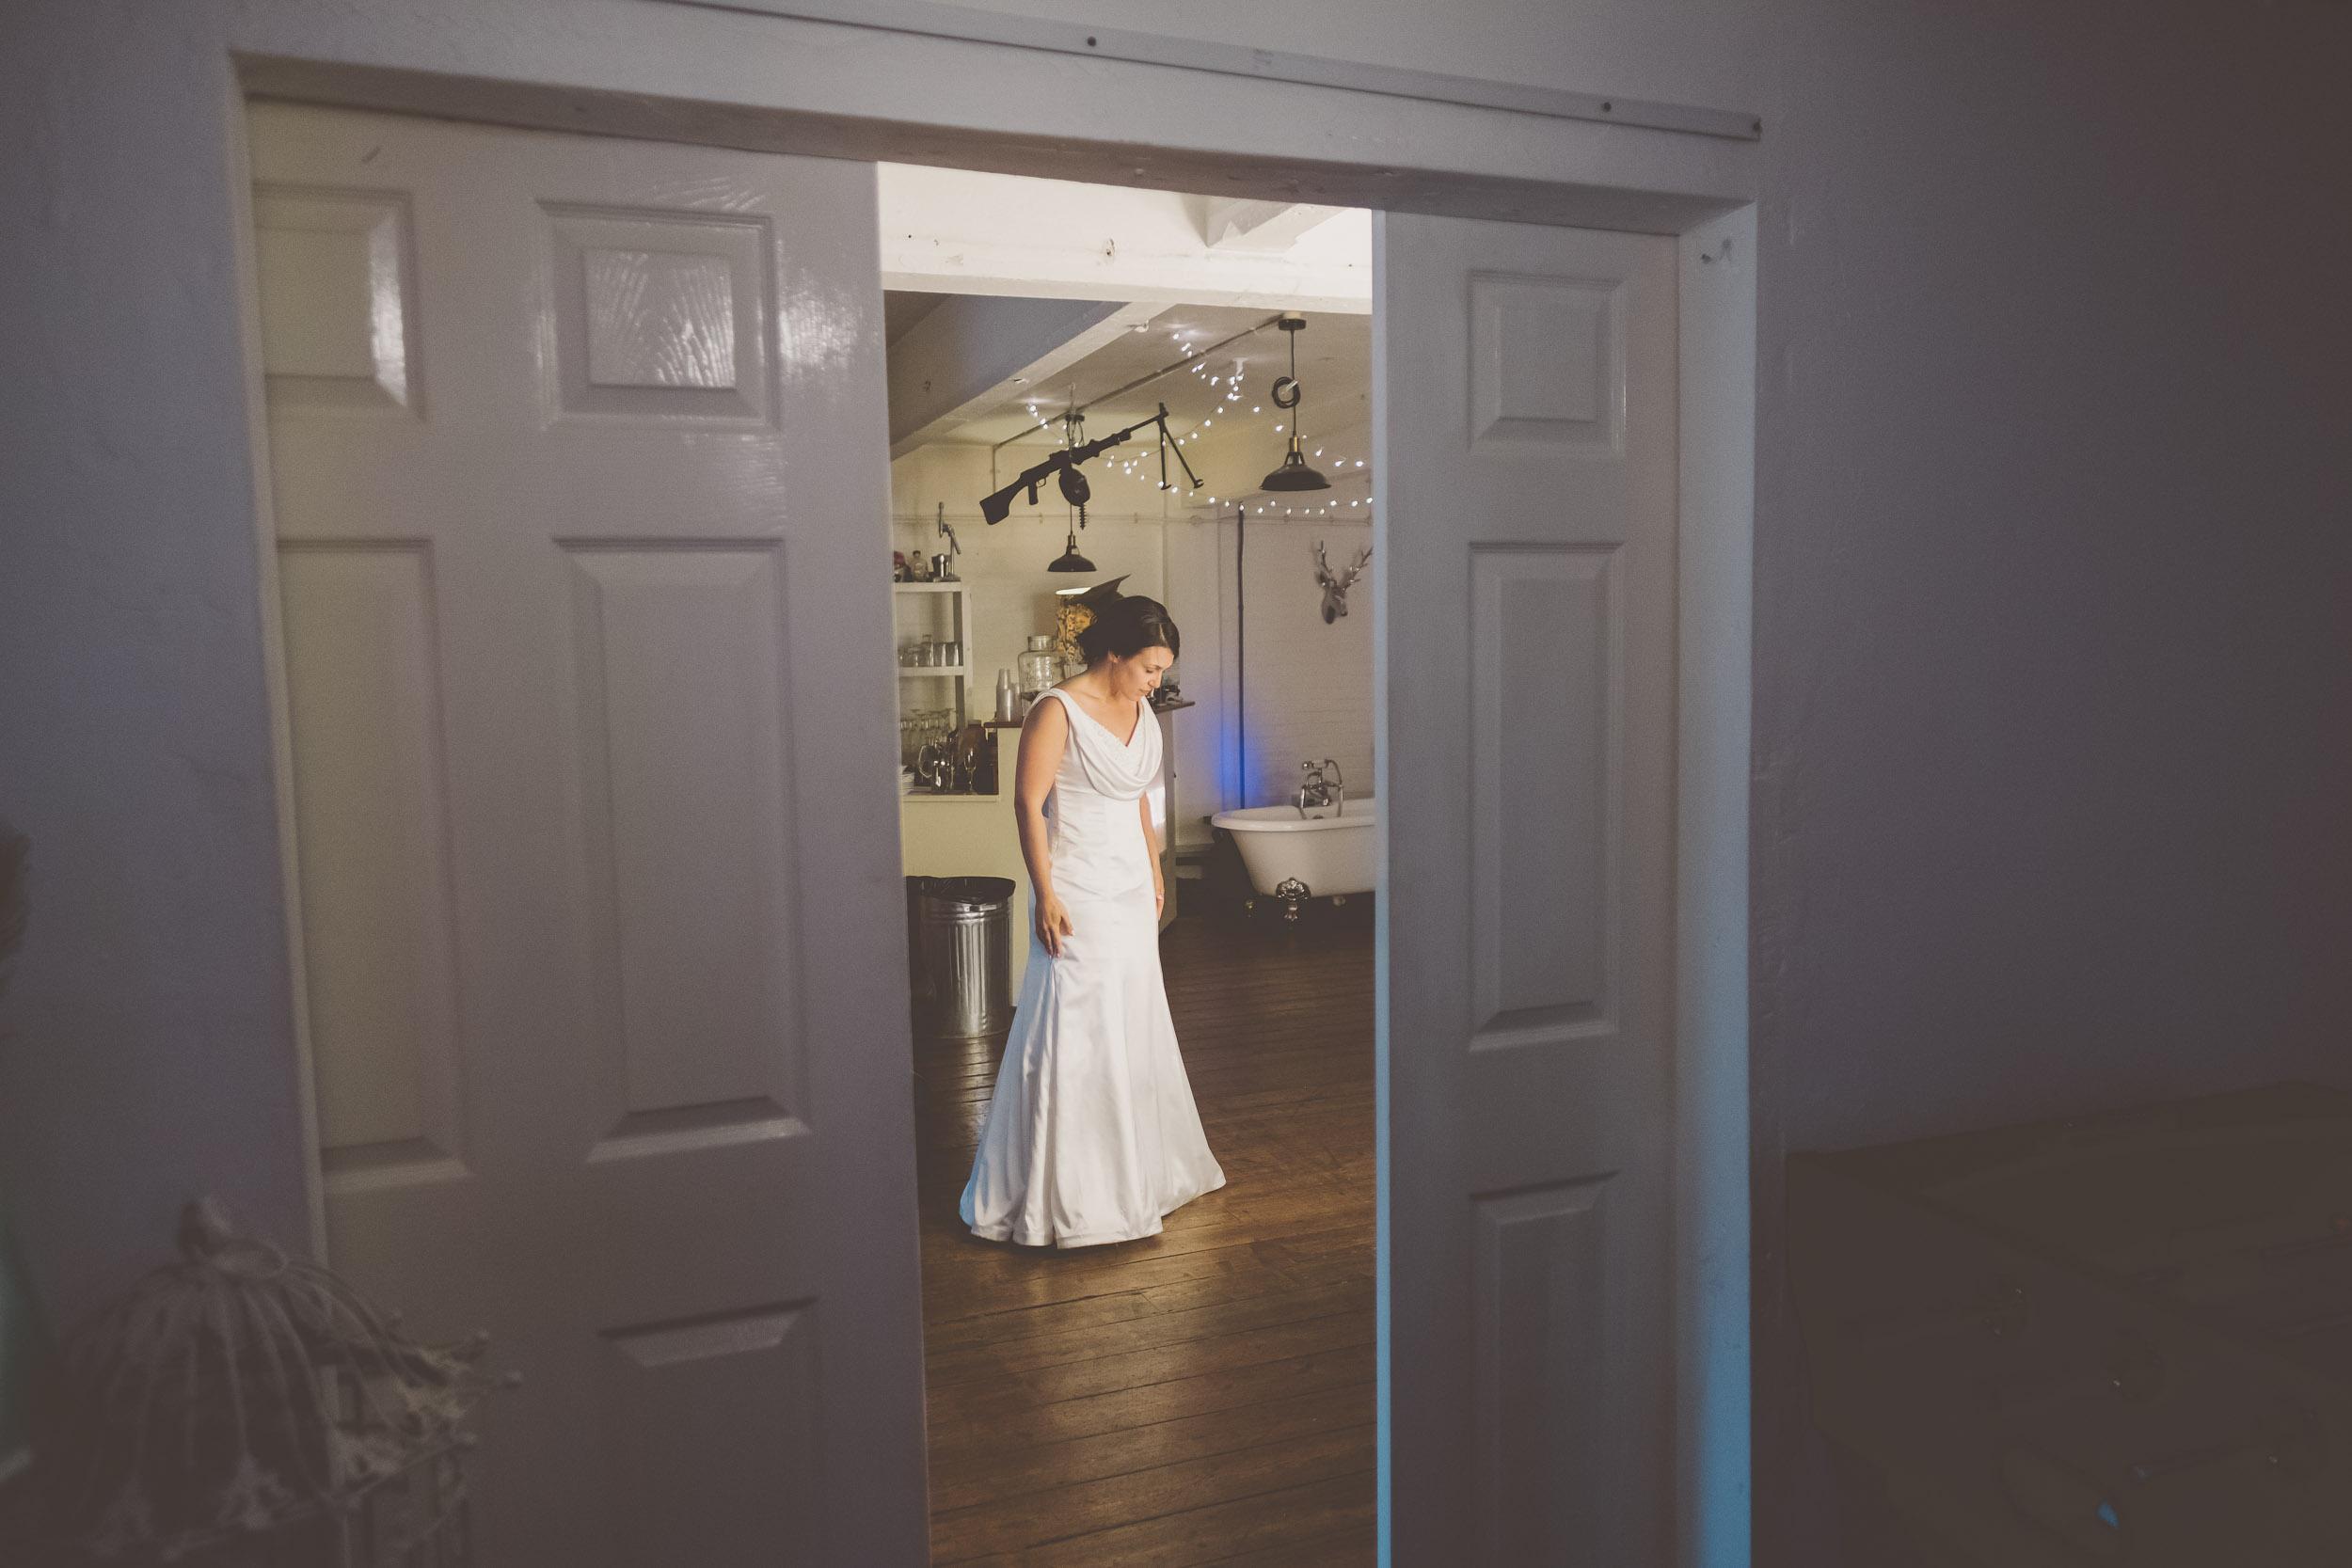 islington-town-hall-4th-floor-studios-wedding340.jpg